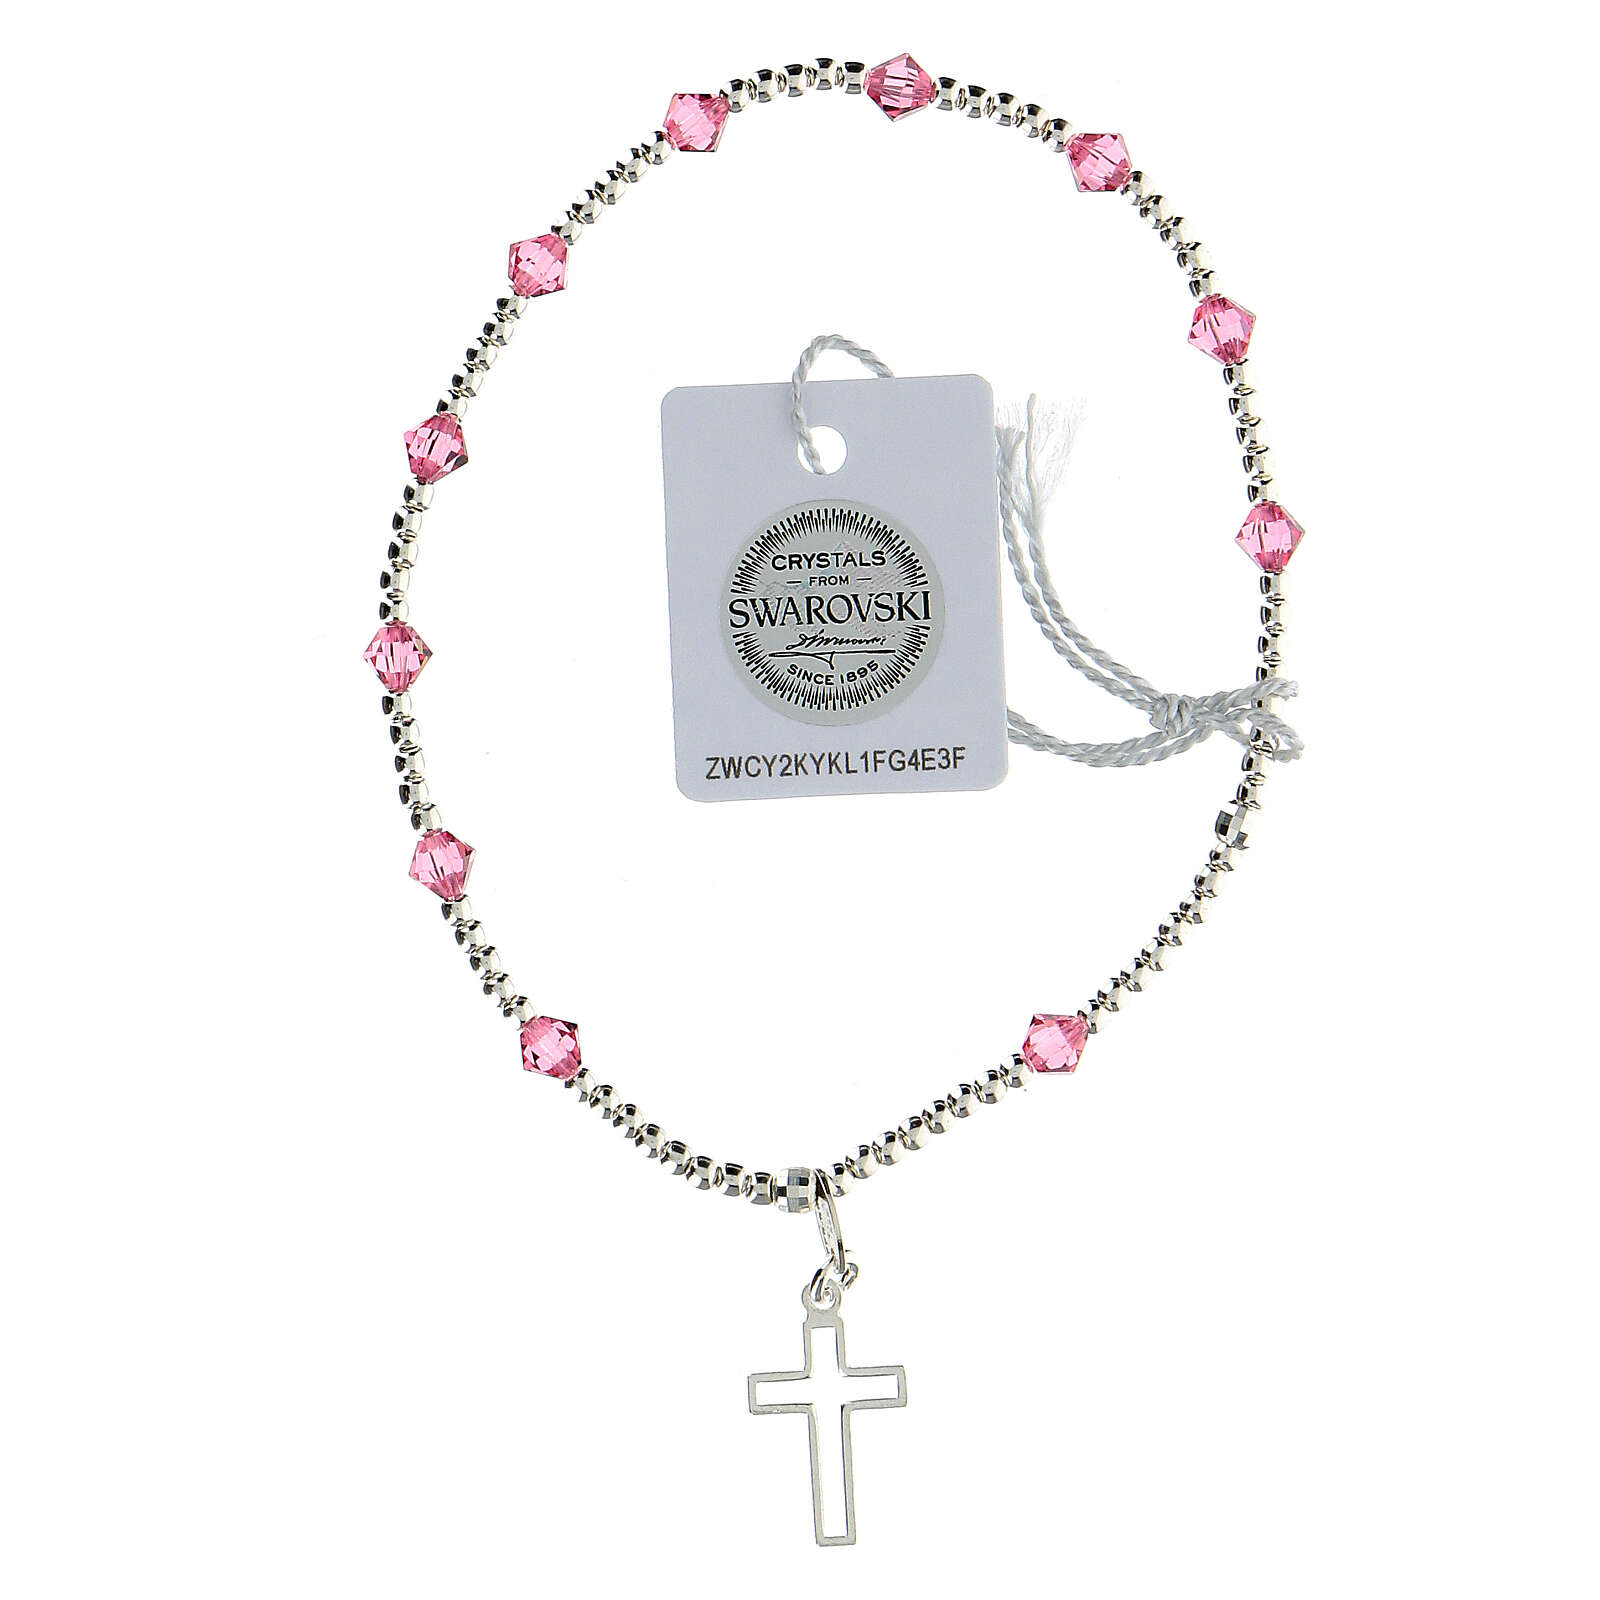 Bracciale Swarovski rosa 4 mm argento 925 croce latina 4